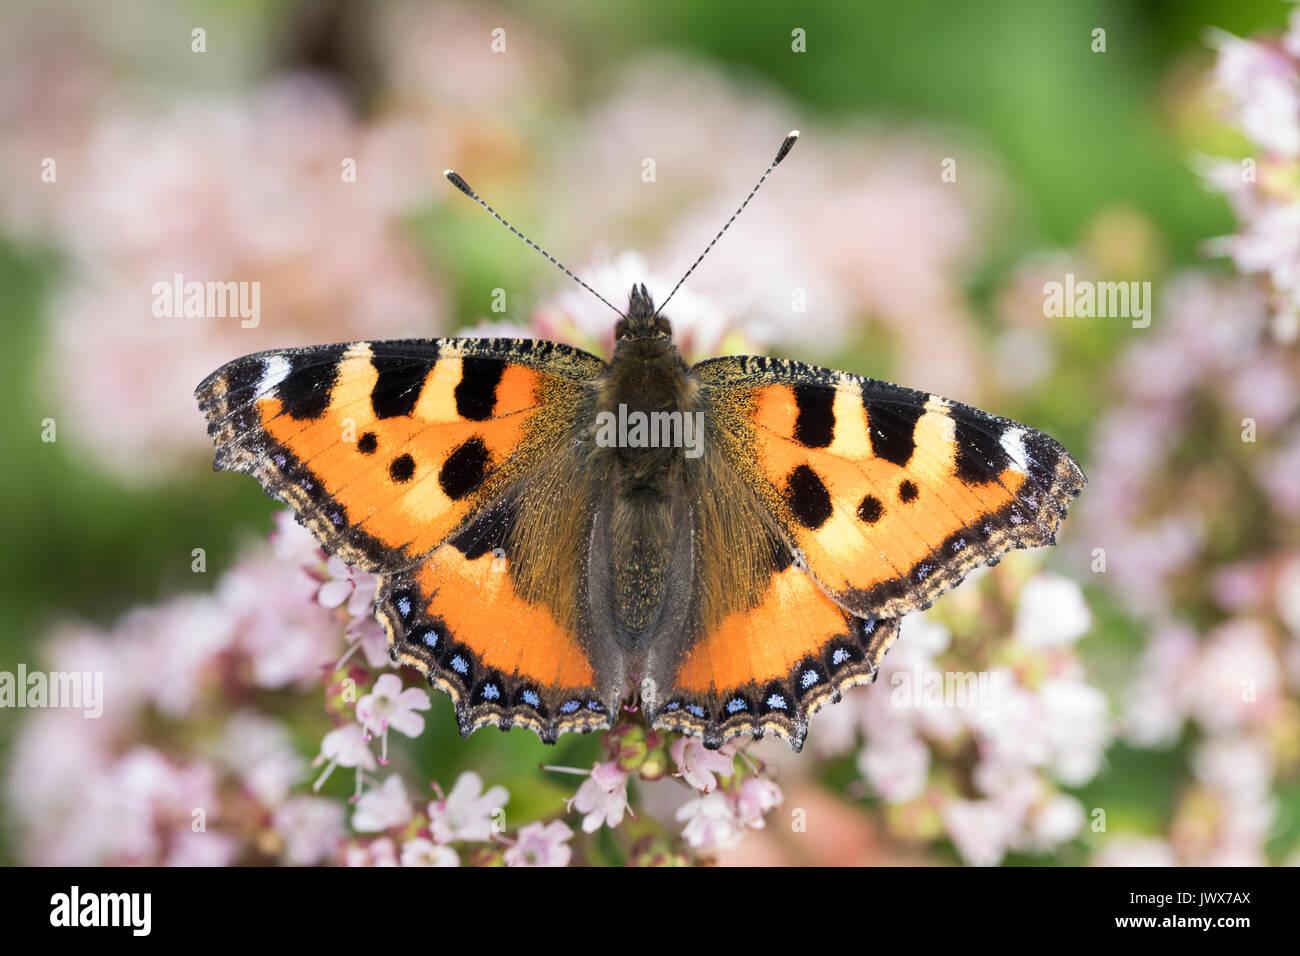 Kleiner Fuchs, Aglais urticae, Nymphalis urticae, small tortoiseshell, La Petite Tortue, Vanesse de l'ortie - Stock Image